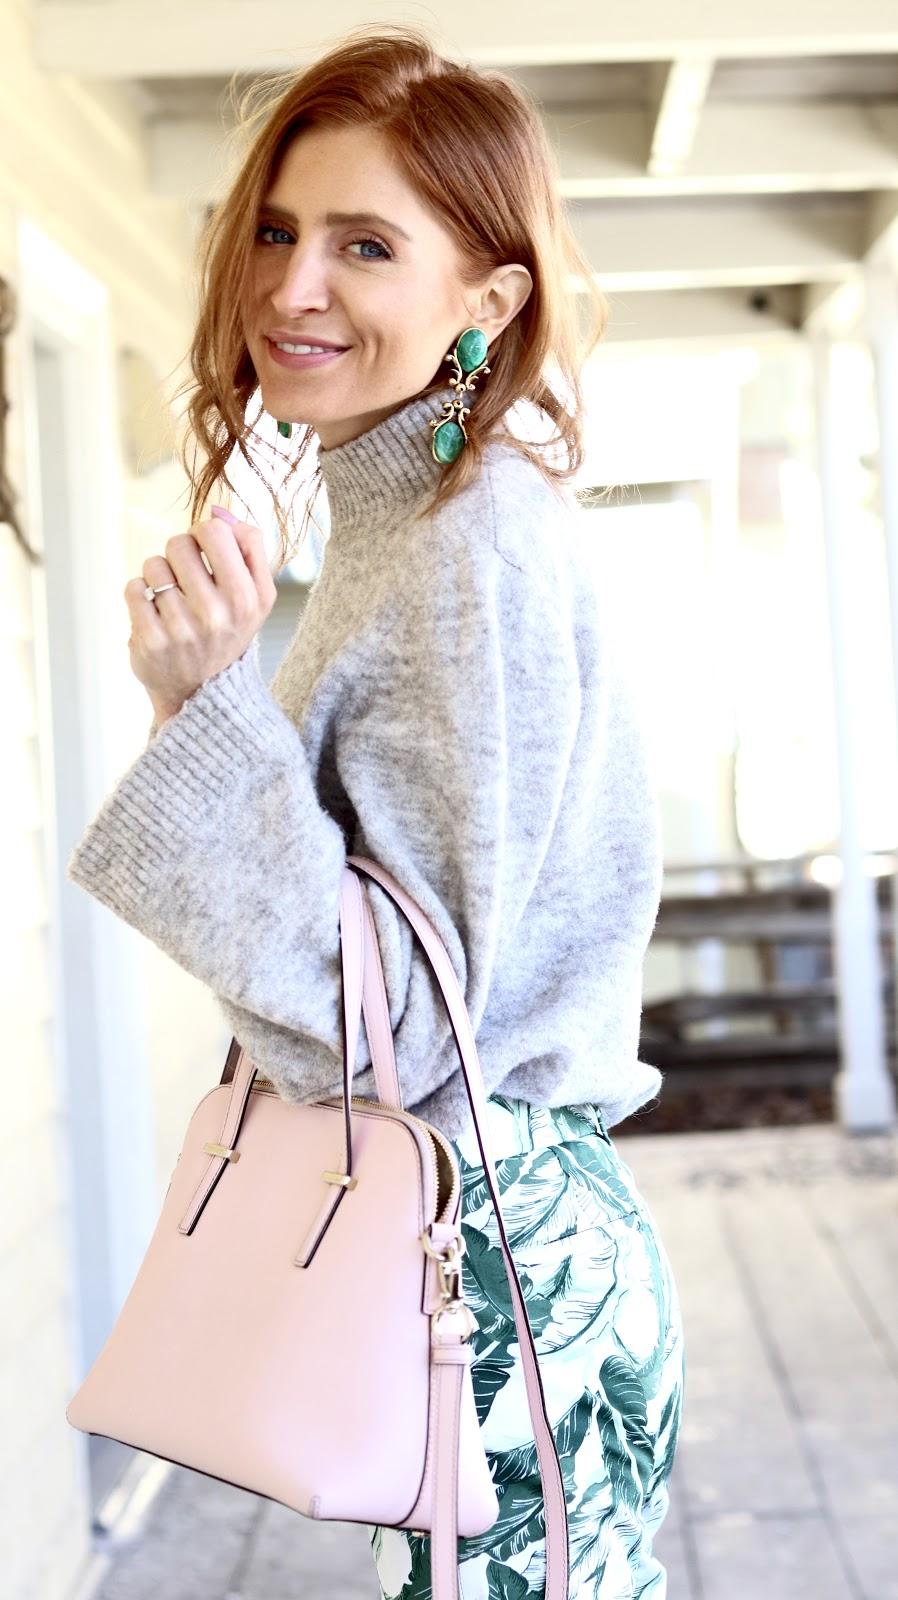 Winter to Spring Dressing, Spring pastels, grey turtleneck flared sleeves, palm print pants Old navy, Kate Spade bag, Expressions white block heel mules